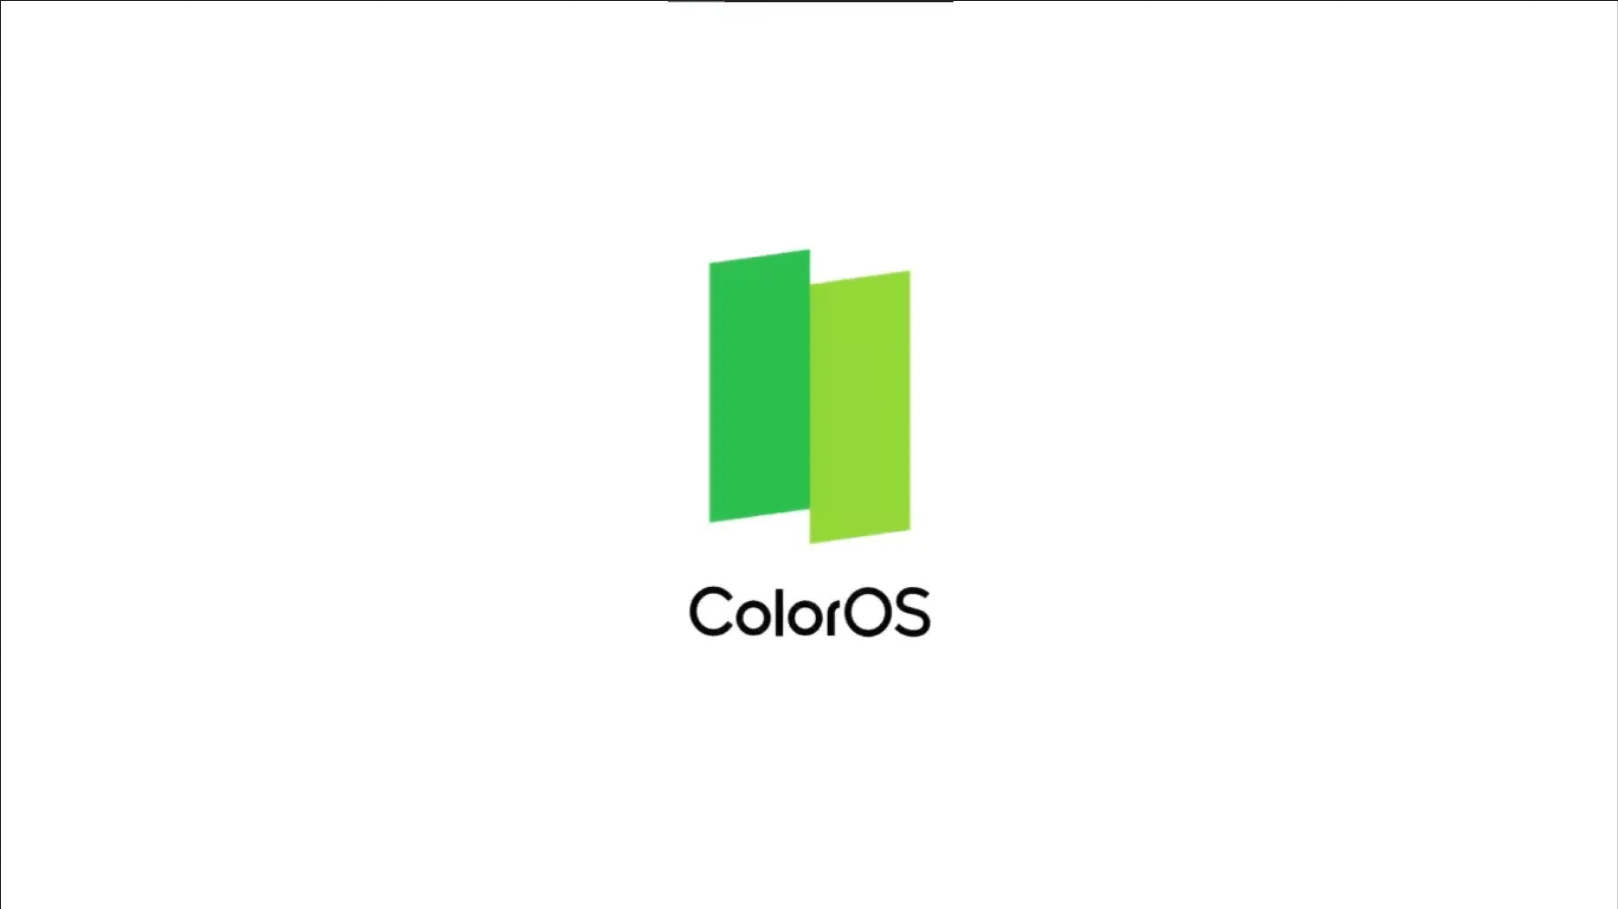 OPPO ColorOS logo